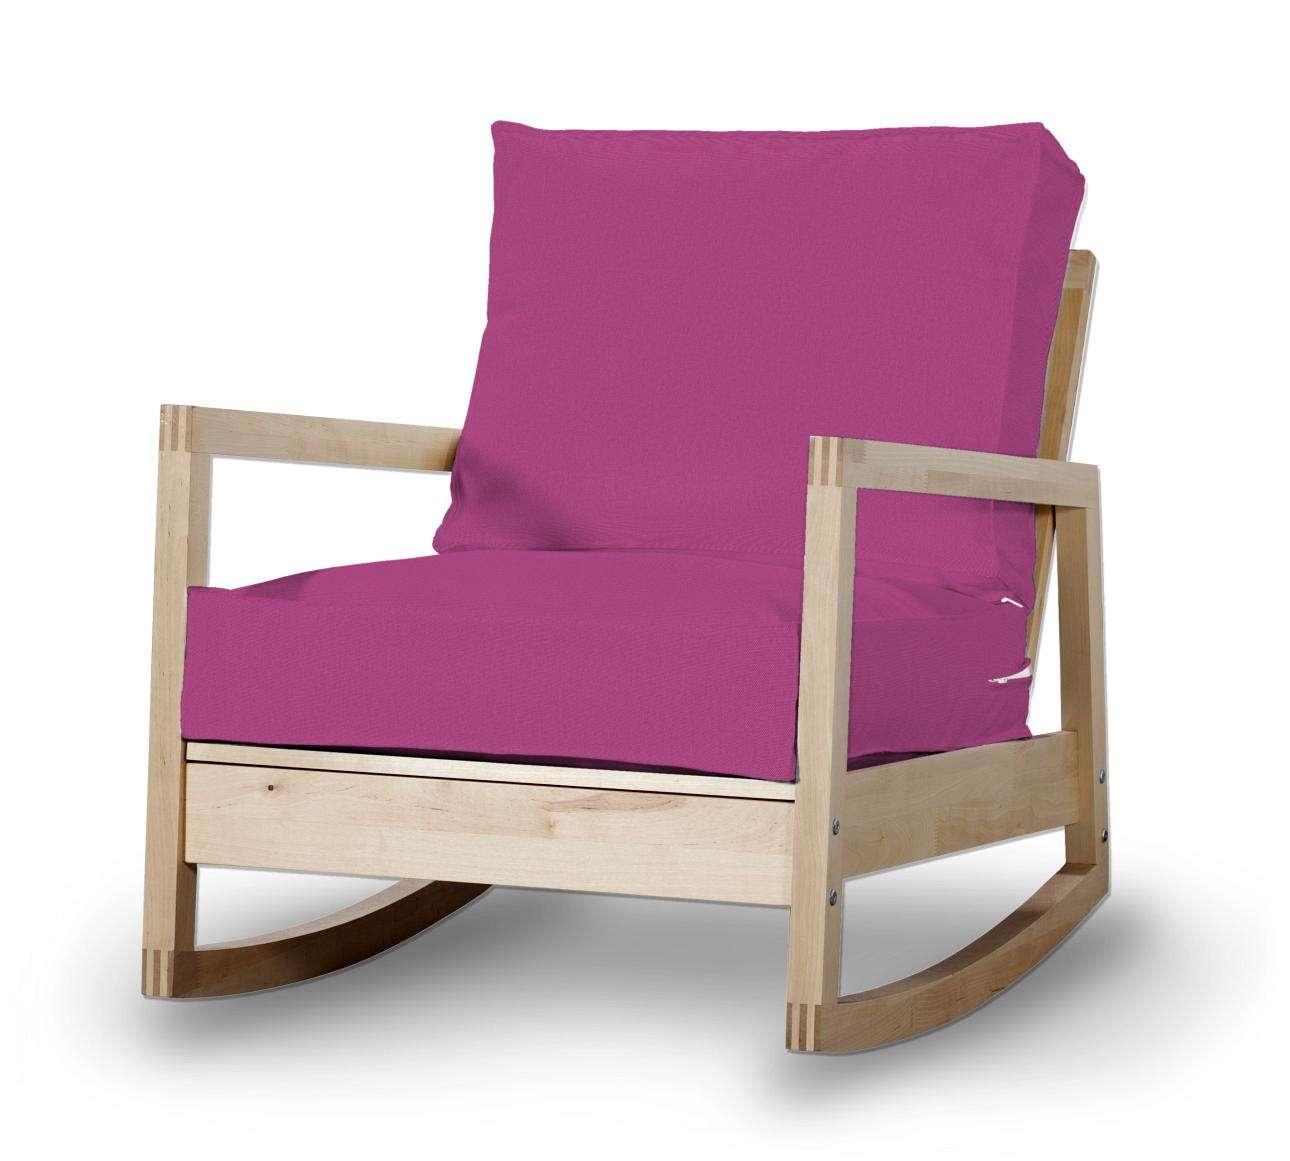 Pokrowiec na fotel Lillberg Fotel Lillberg w kolekcji Etna , tkanina: 705-23